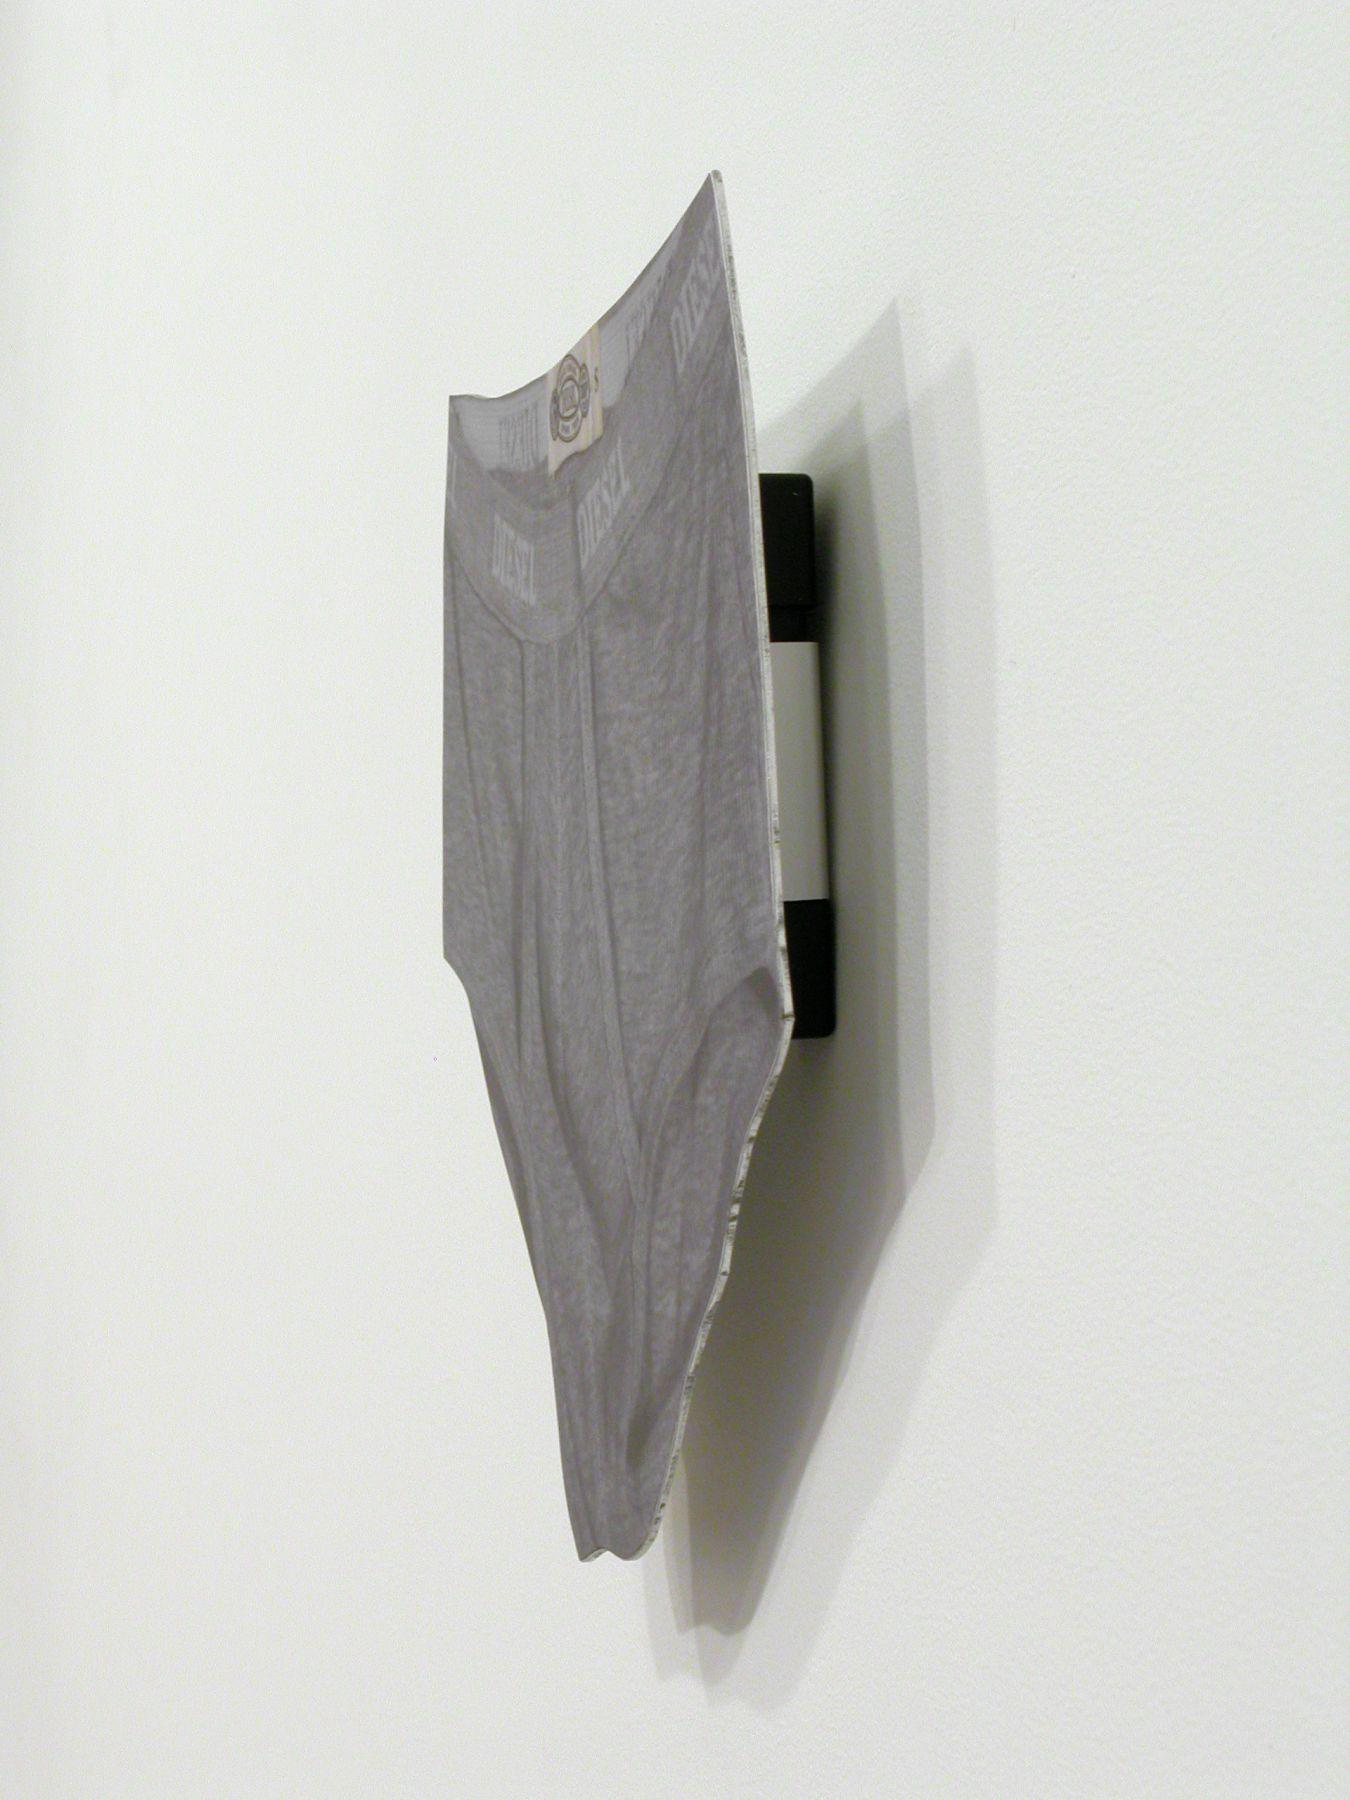 Jim Drain, Untitled (Diesel Underwear), 2007, C-print, Mounted on Aluminum, 10 1/2 x 11 1/2 x 1 inches